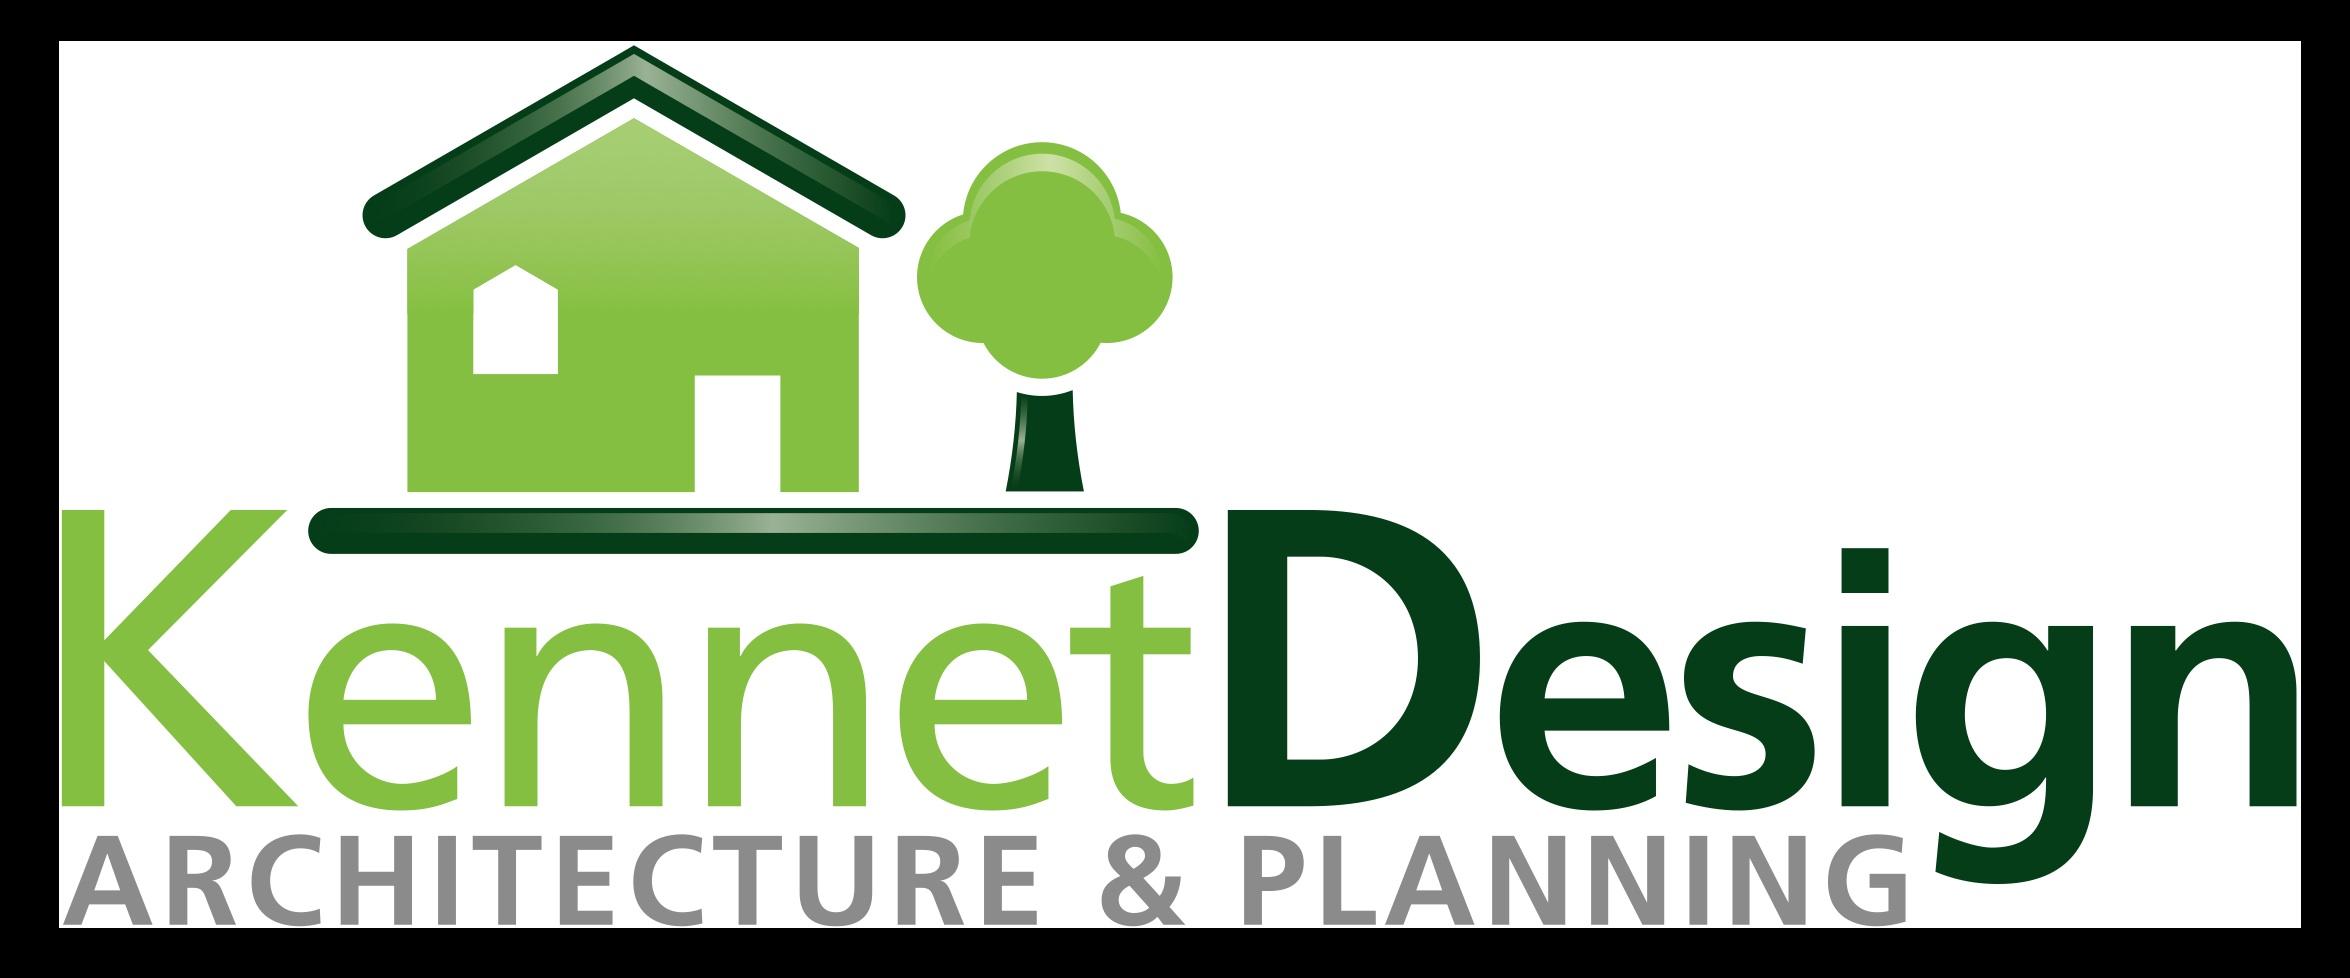 Kennet Design